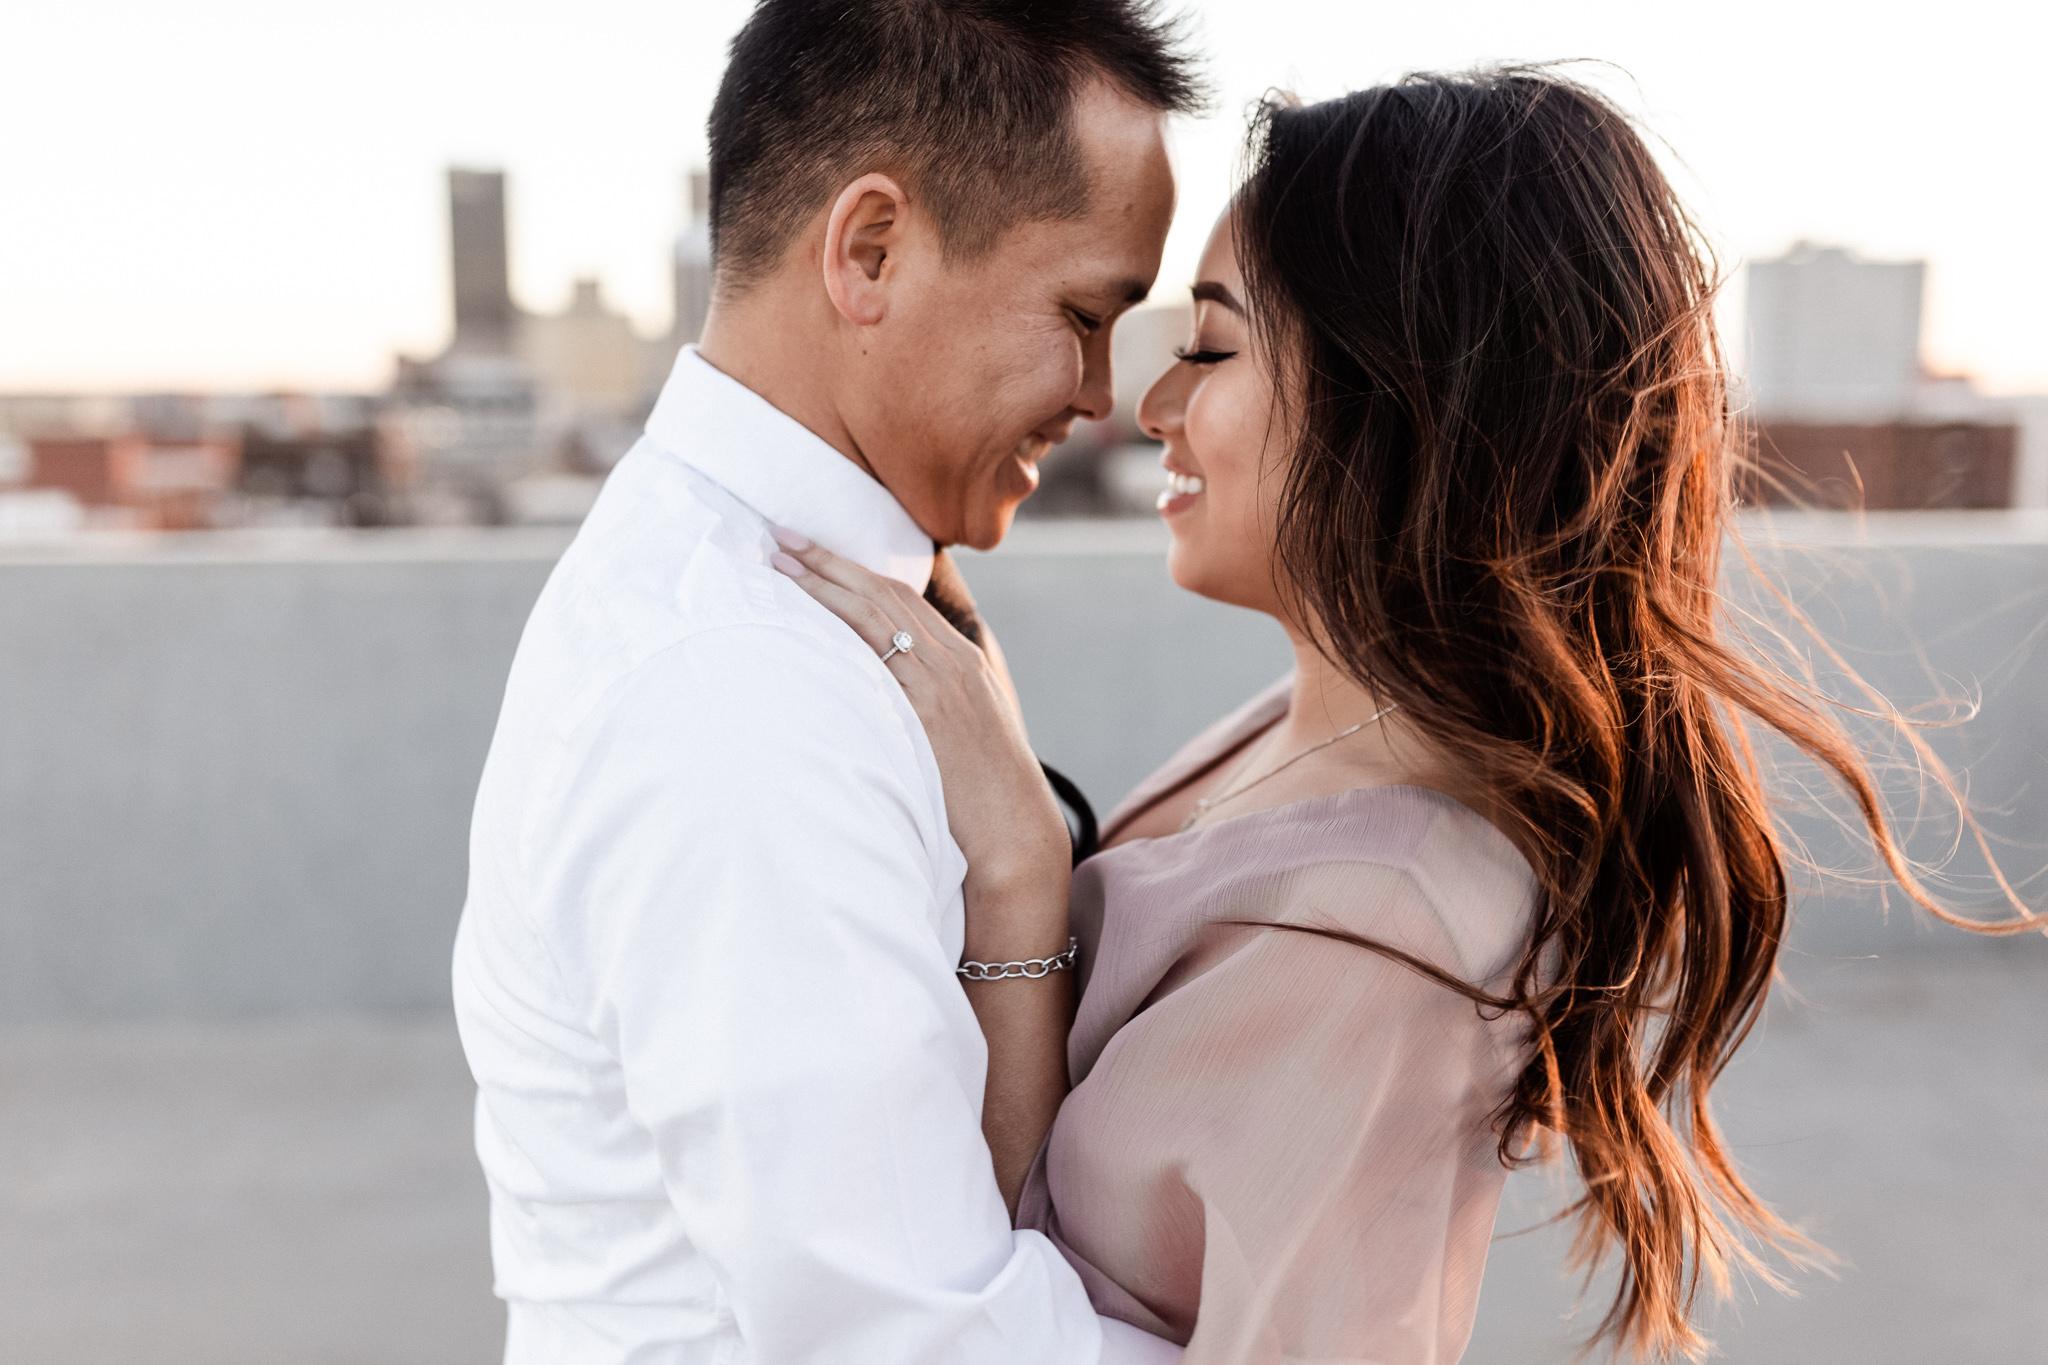 Hieu + Teresa | Colorful Romantic Downtown Engagements | Oklahoma Wedding Photographer-59.jpg